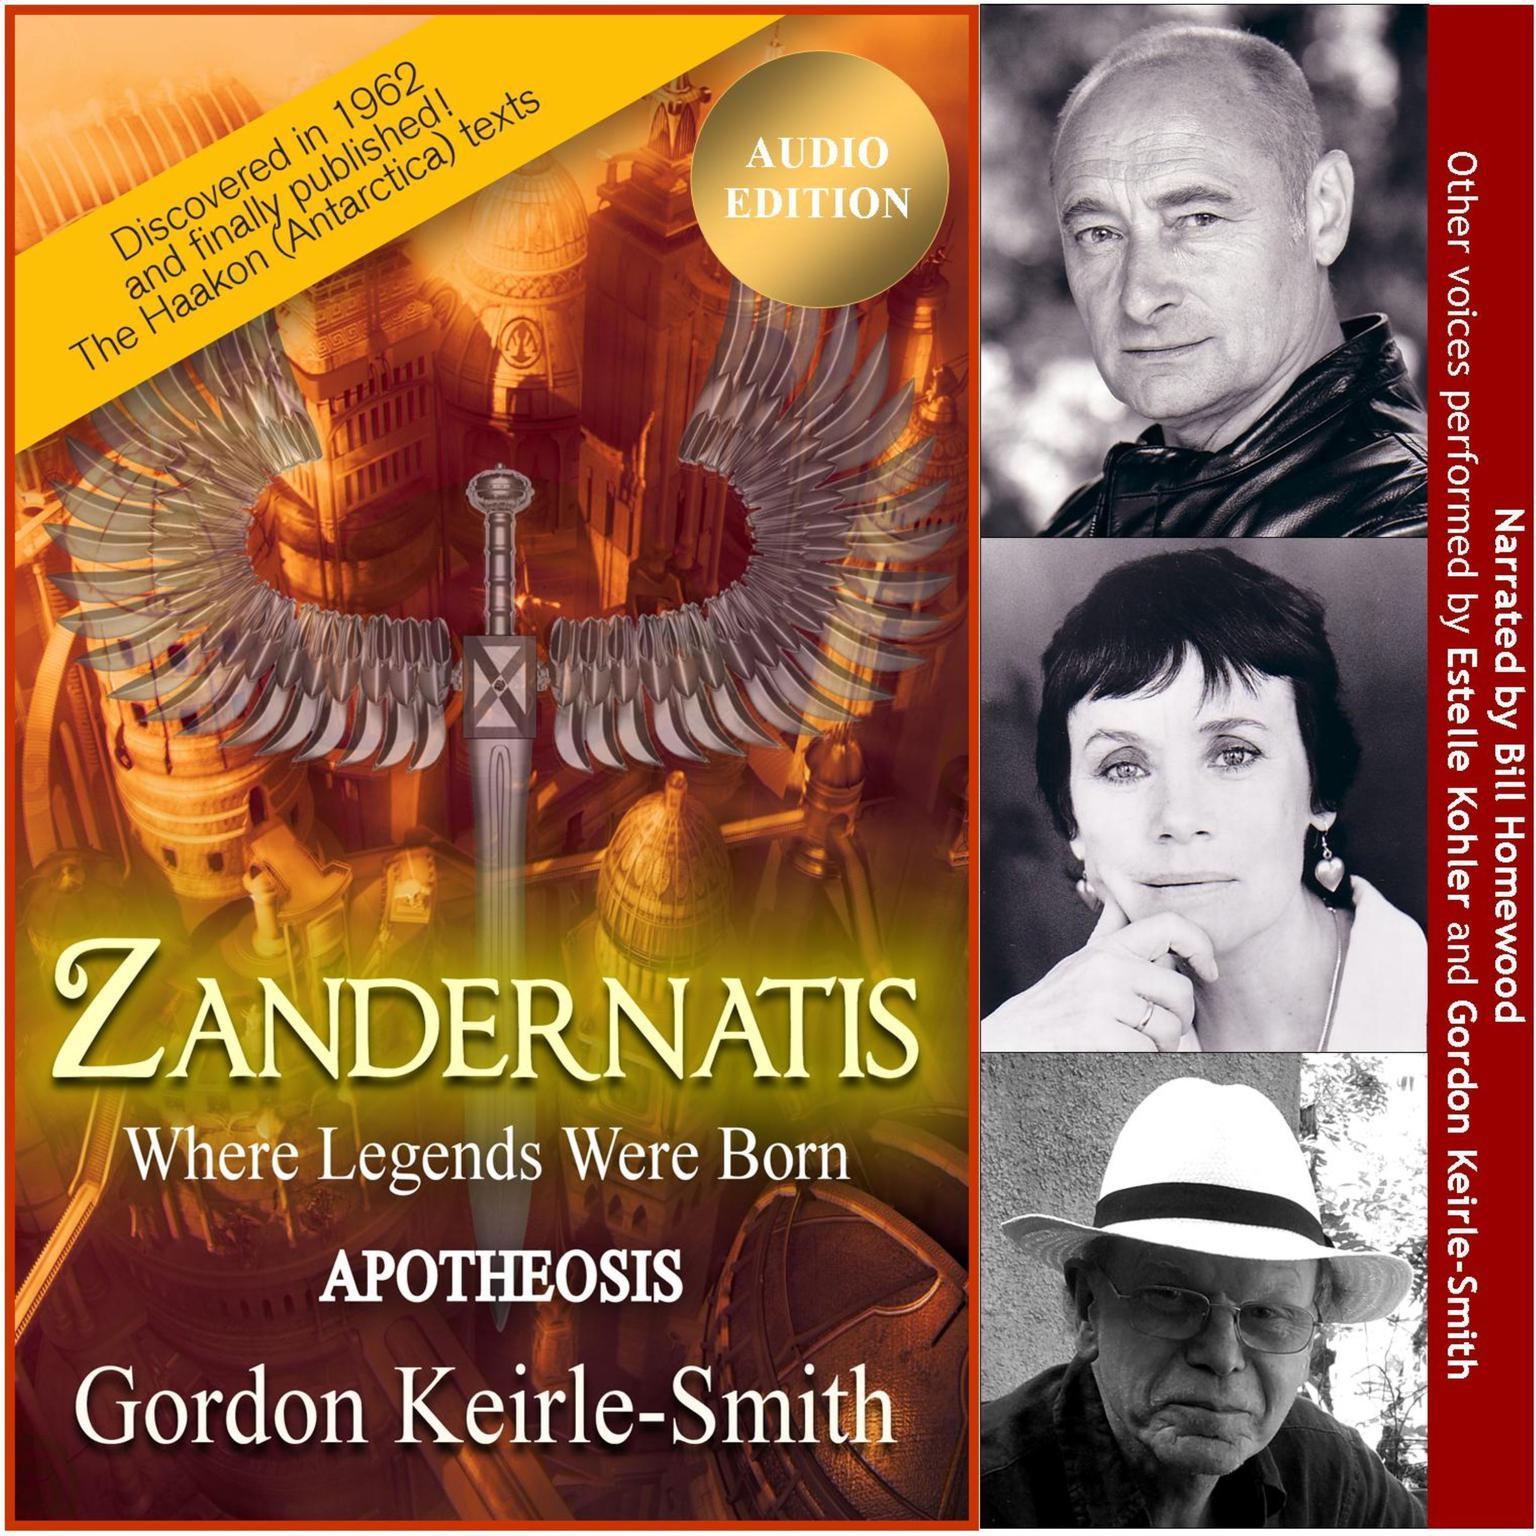 Zandernatis - Volume Three - Apotheosis Audiobook, by Gordon Keirle-Smith